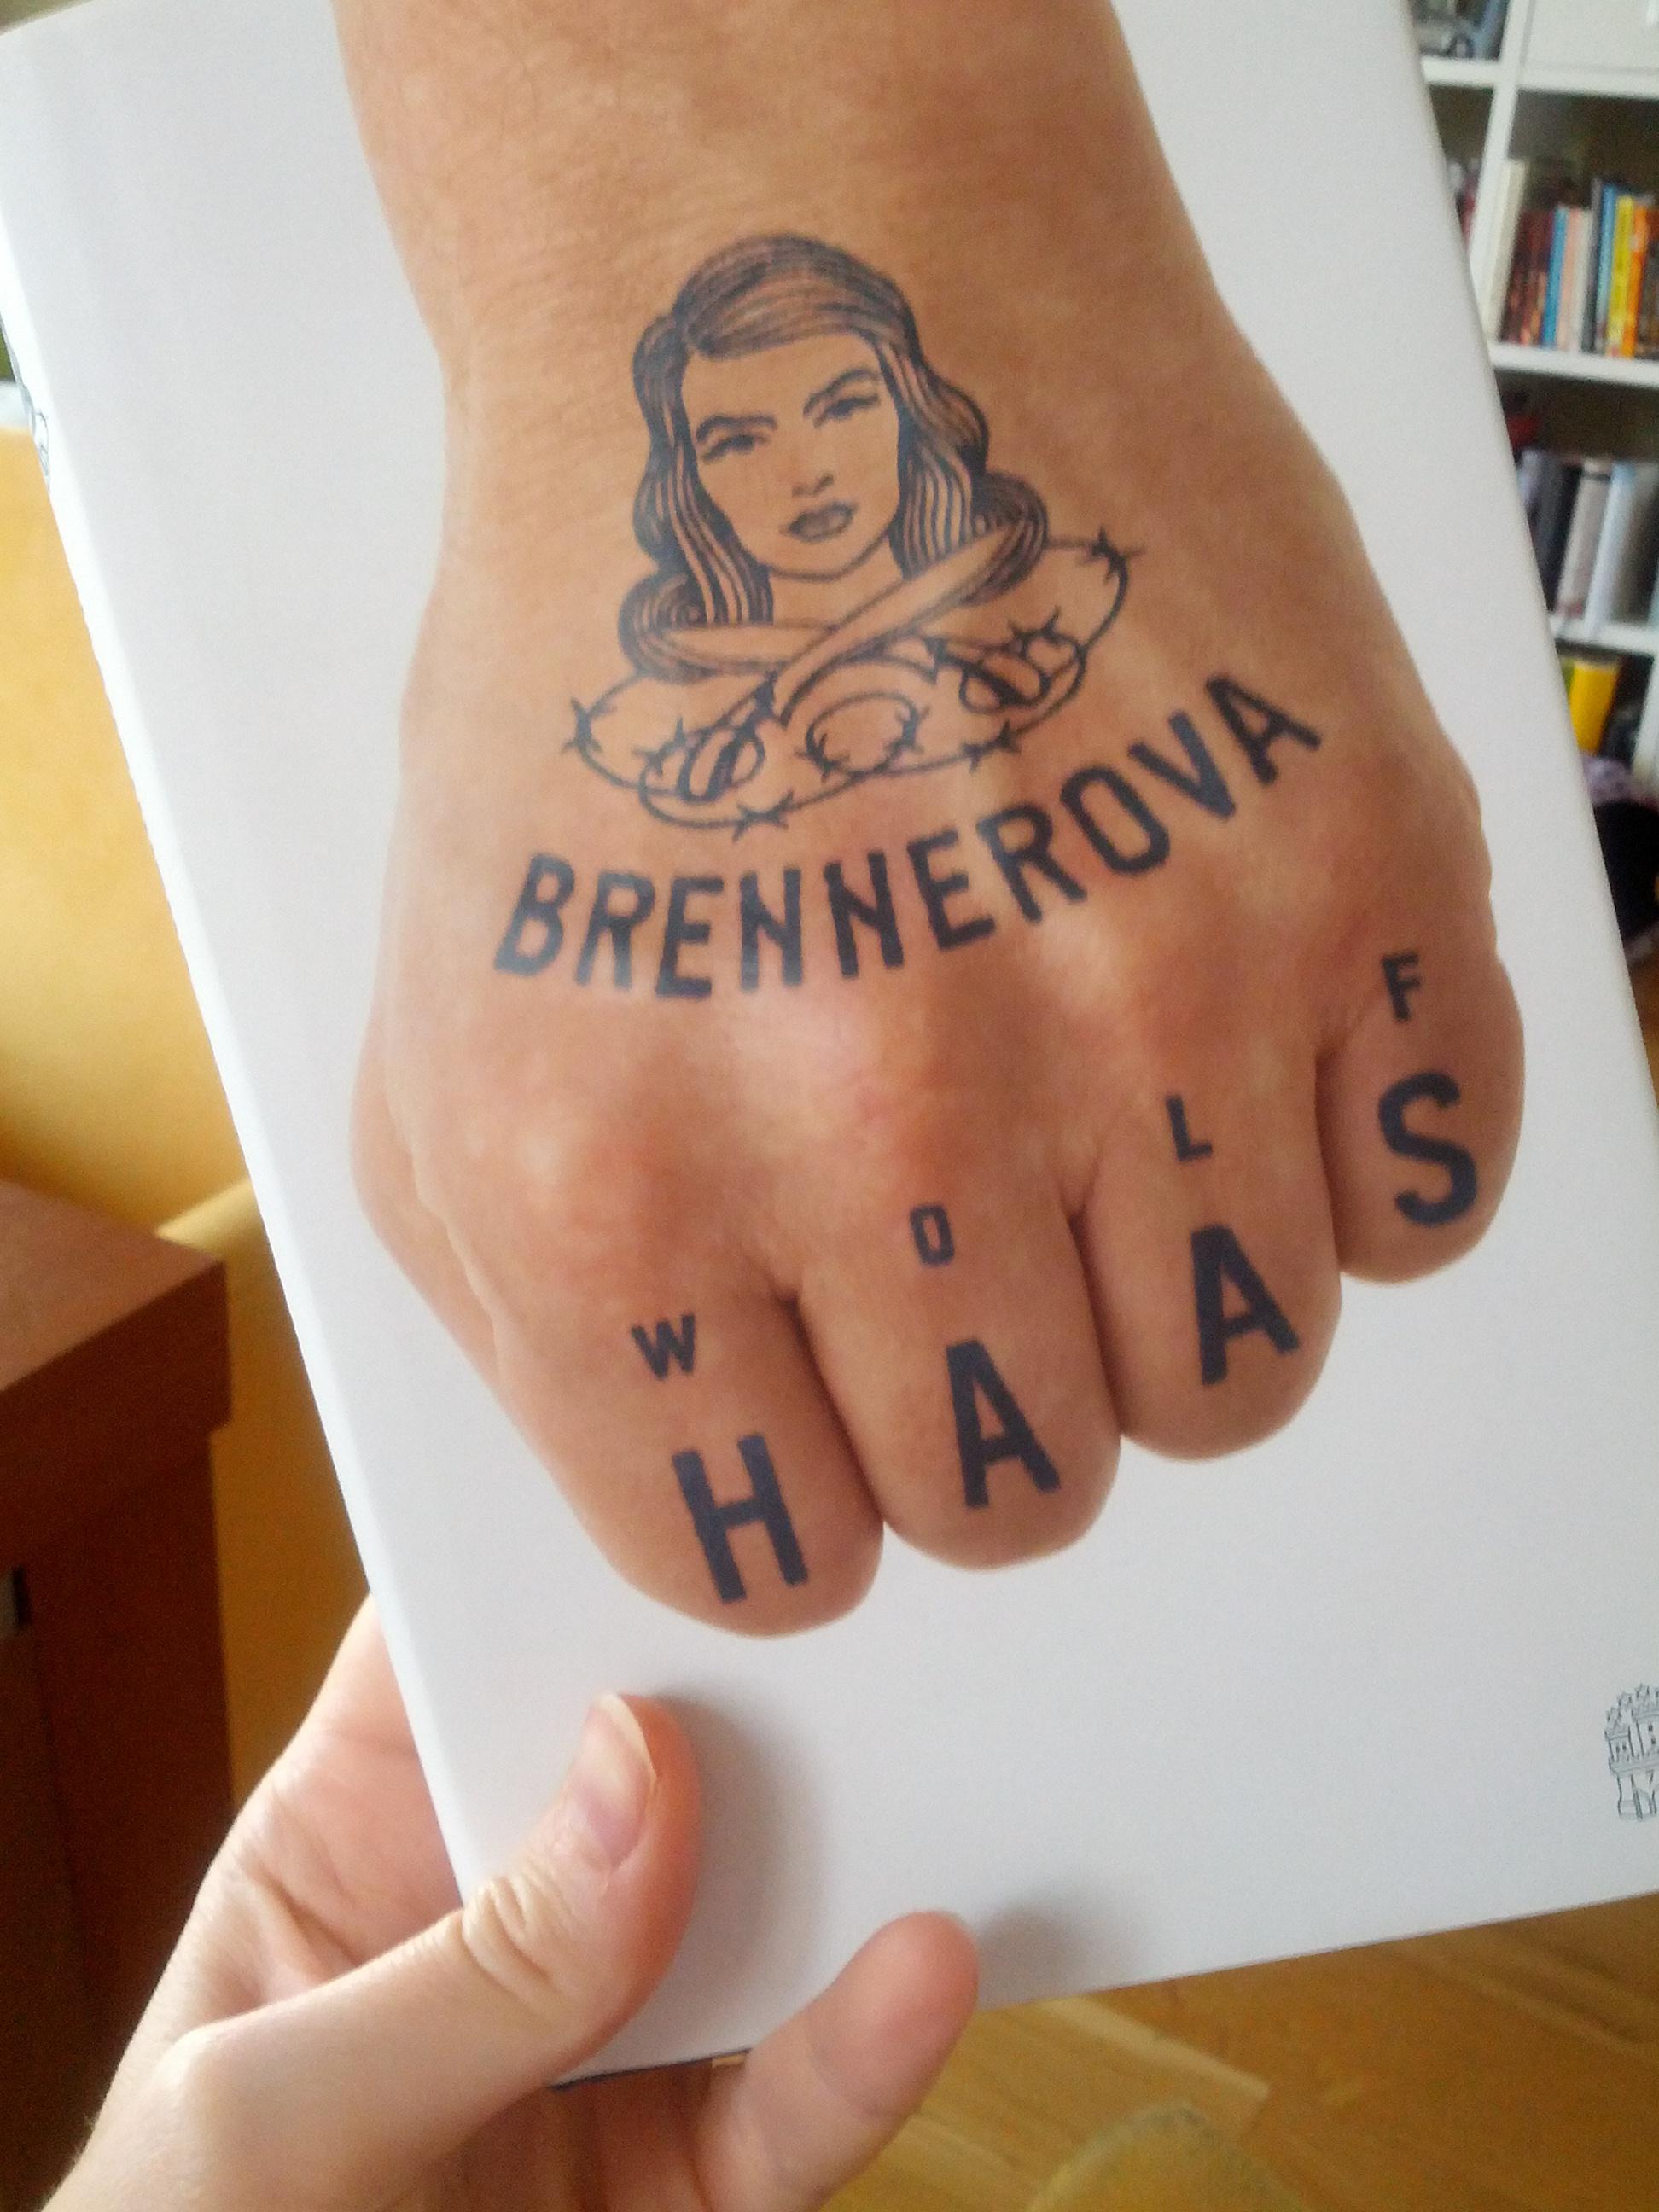 Wolf Haas: Brennerova